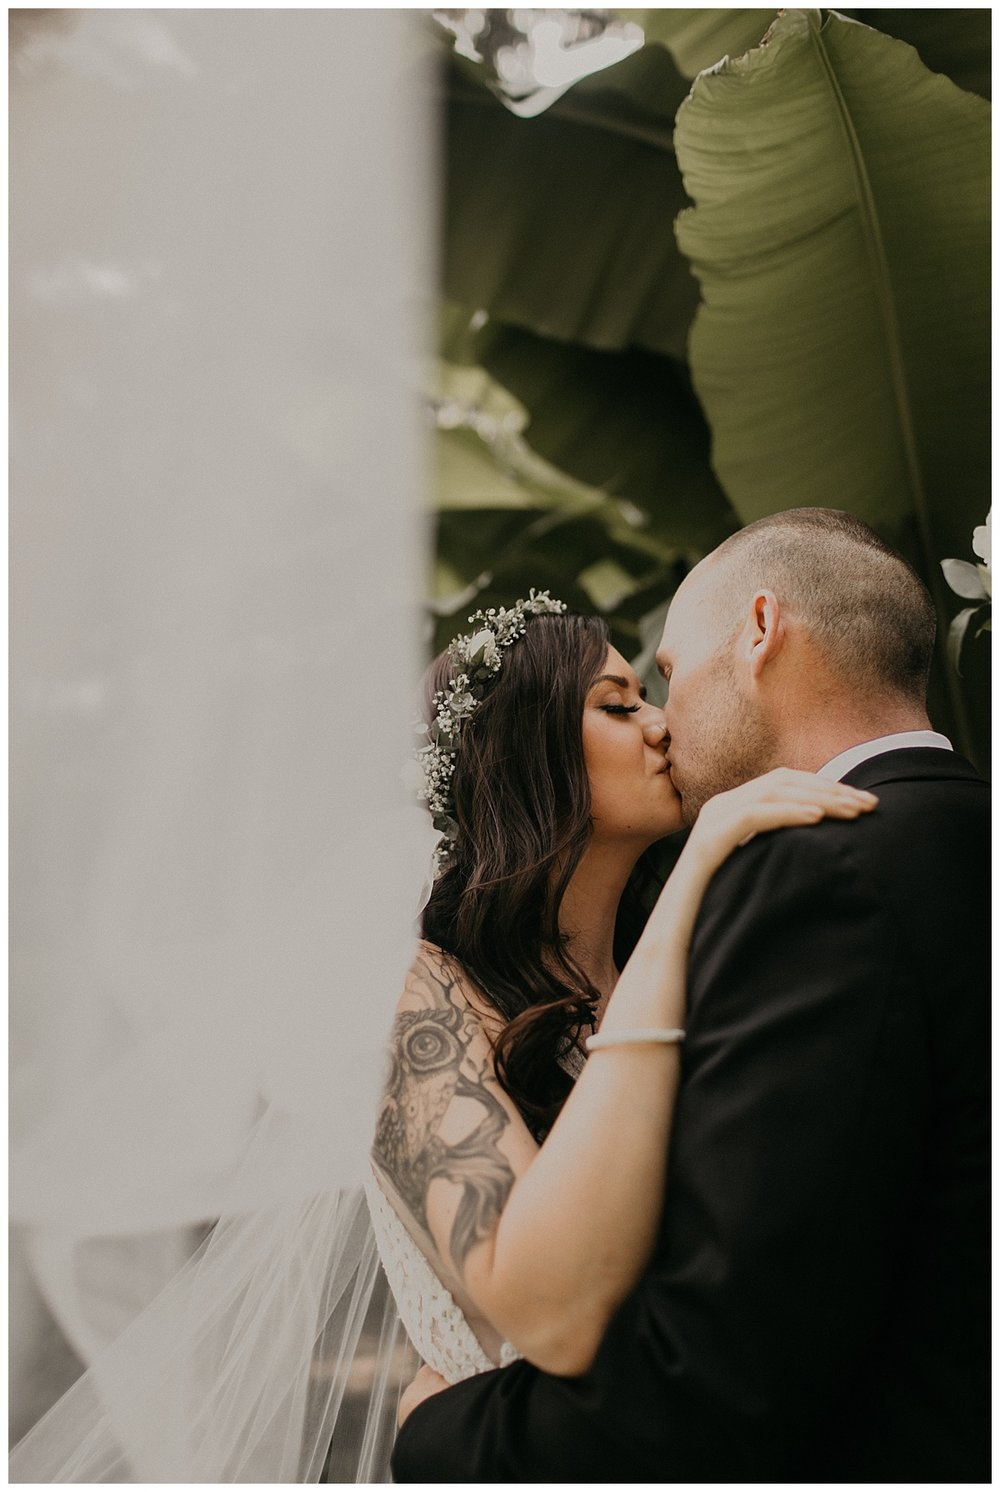 Samantha-McFarlen-PNW-Wedding-Photographer-Maroni-Meadows_1960.jpg